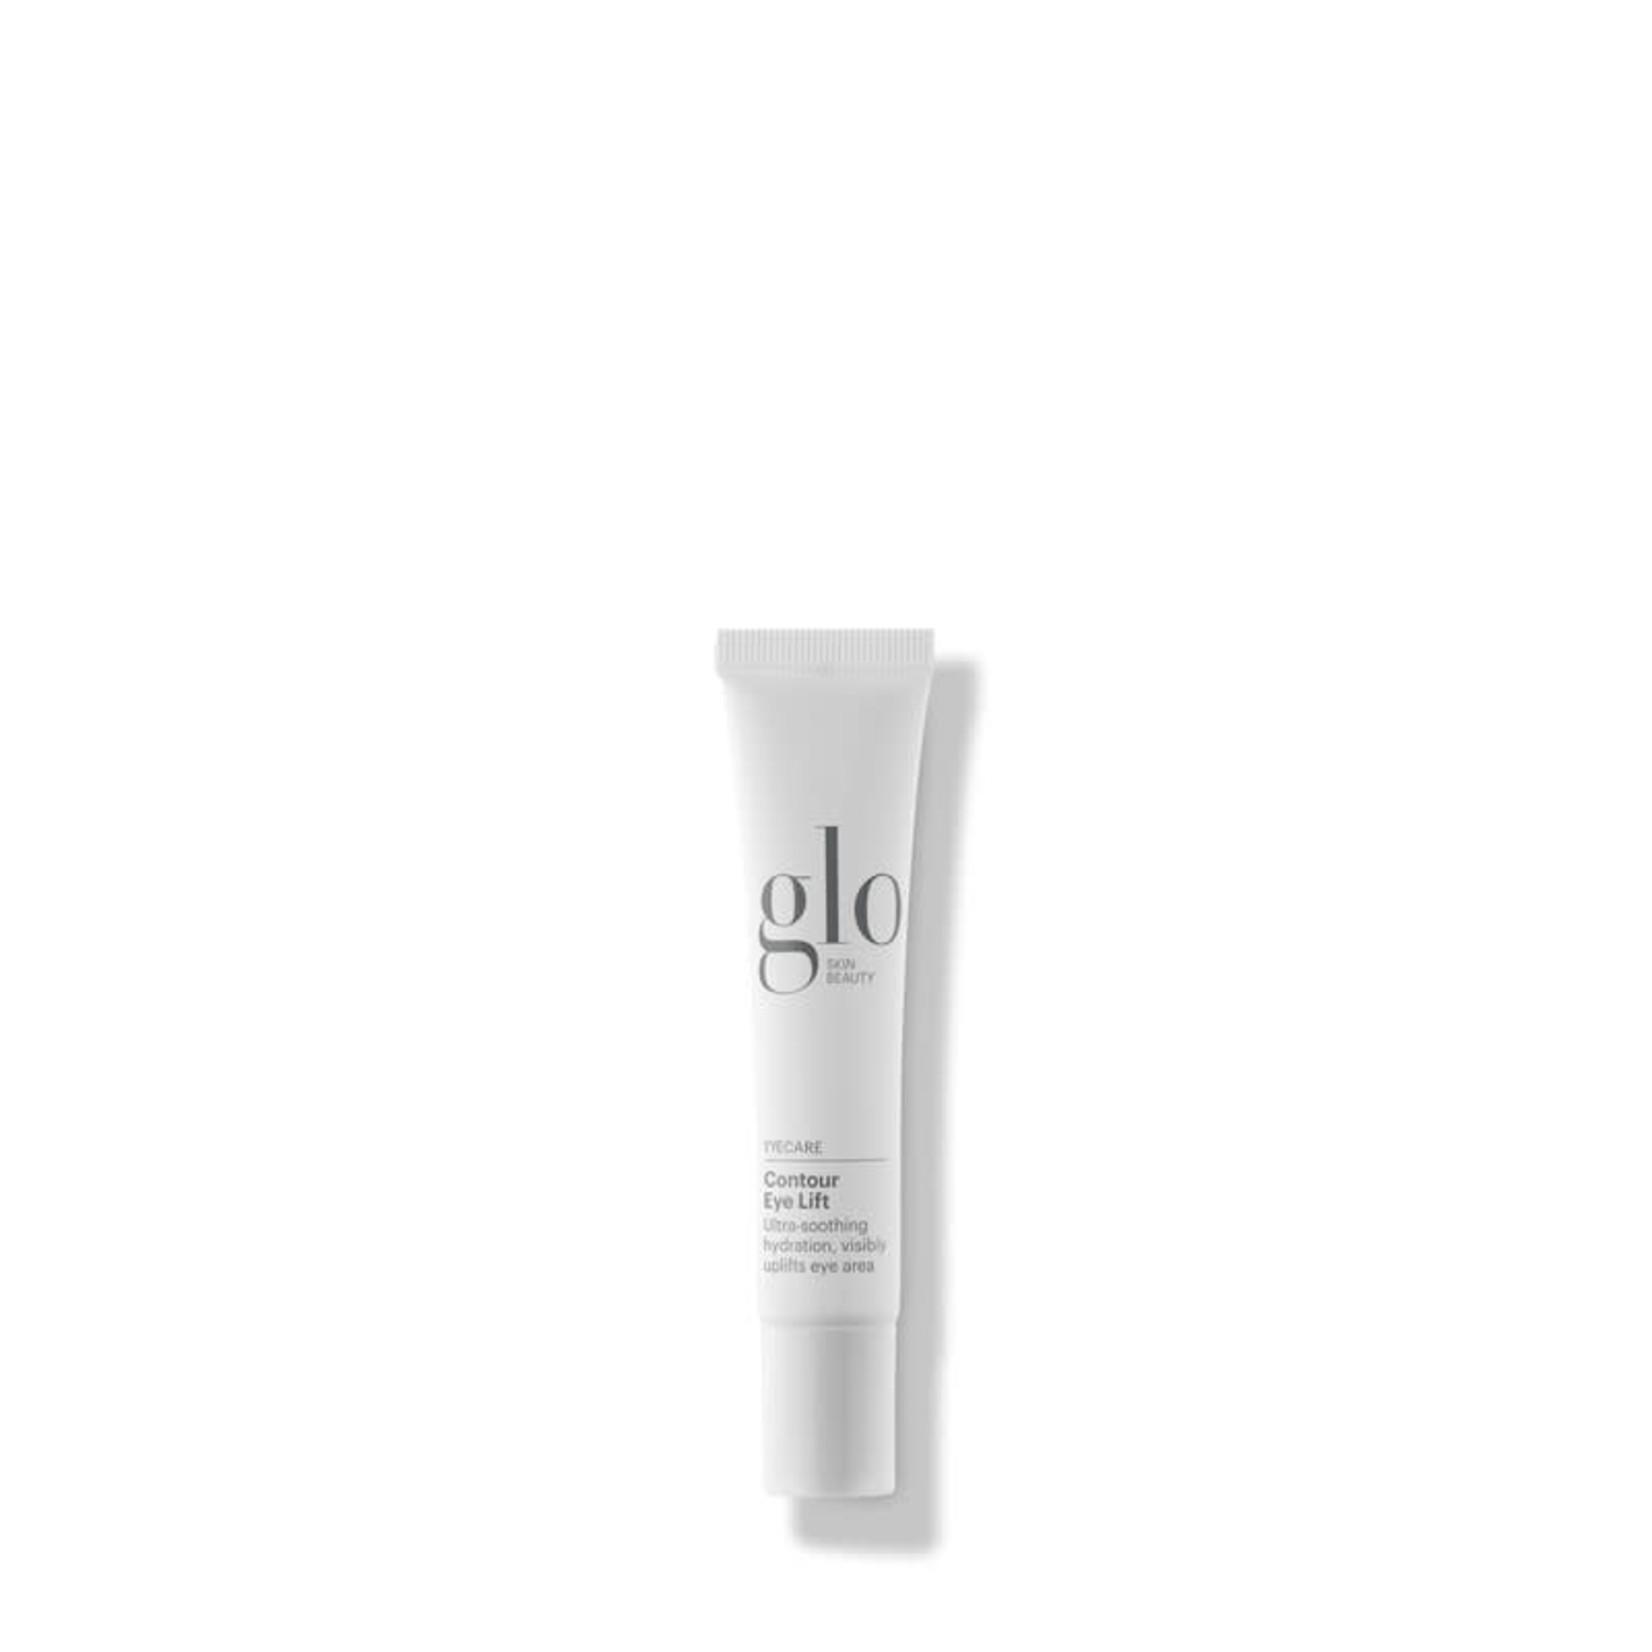 Glo Skin Beauty Contour Eye Lift